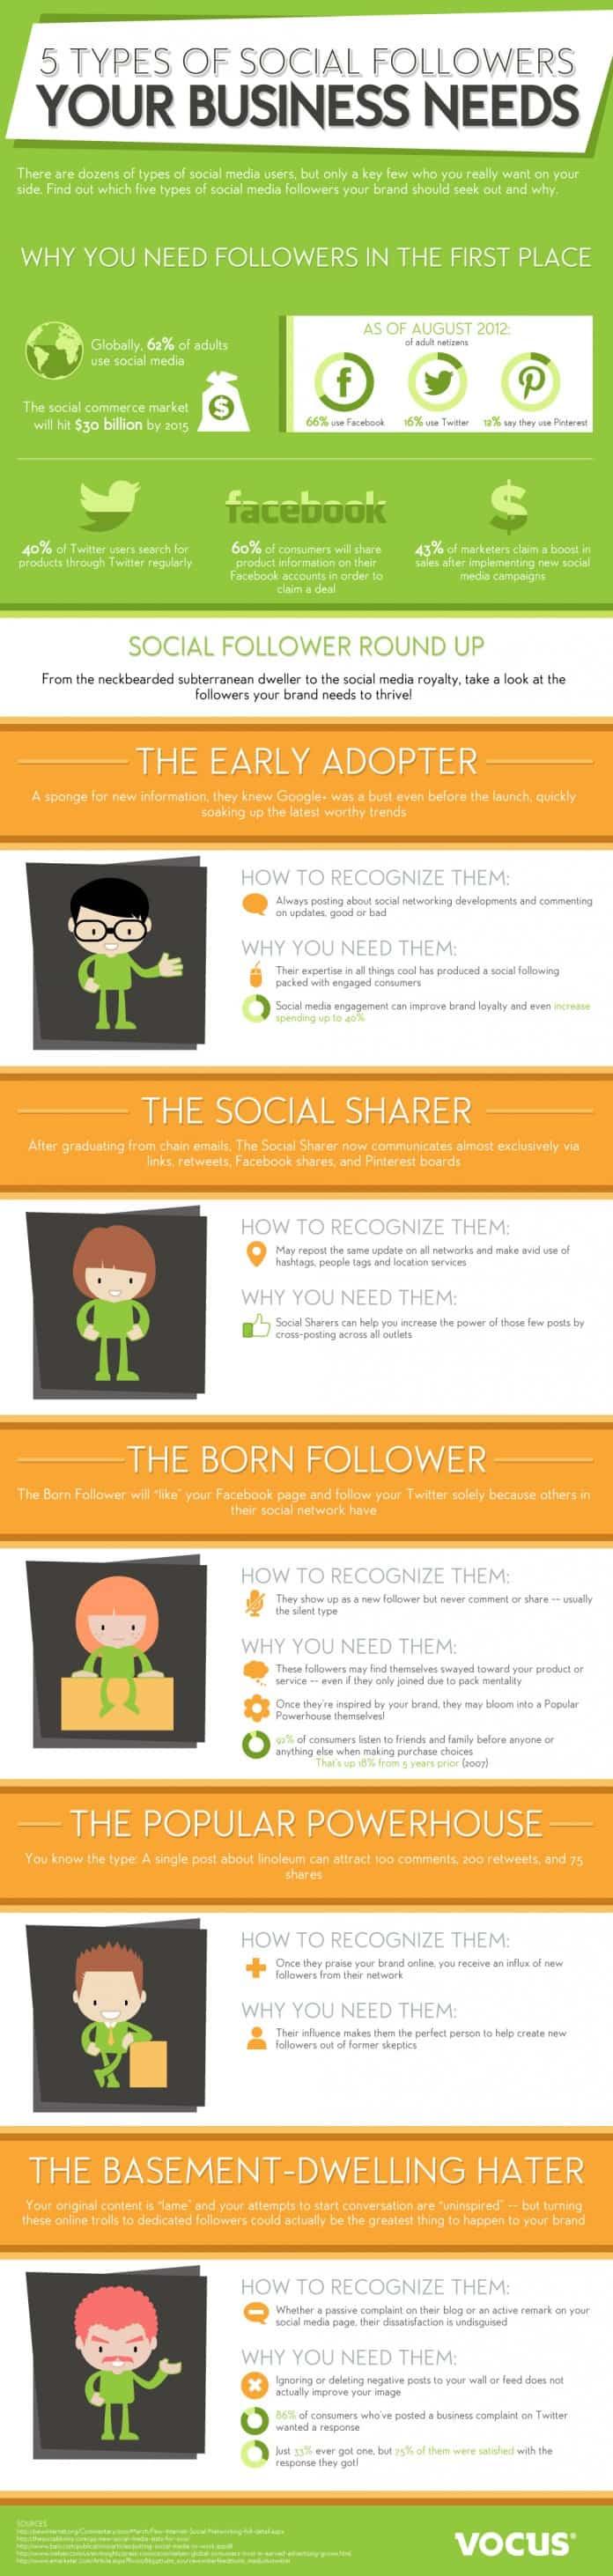 social-follower-round-up